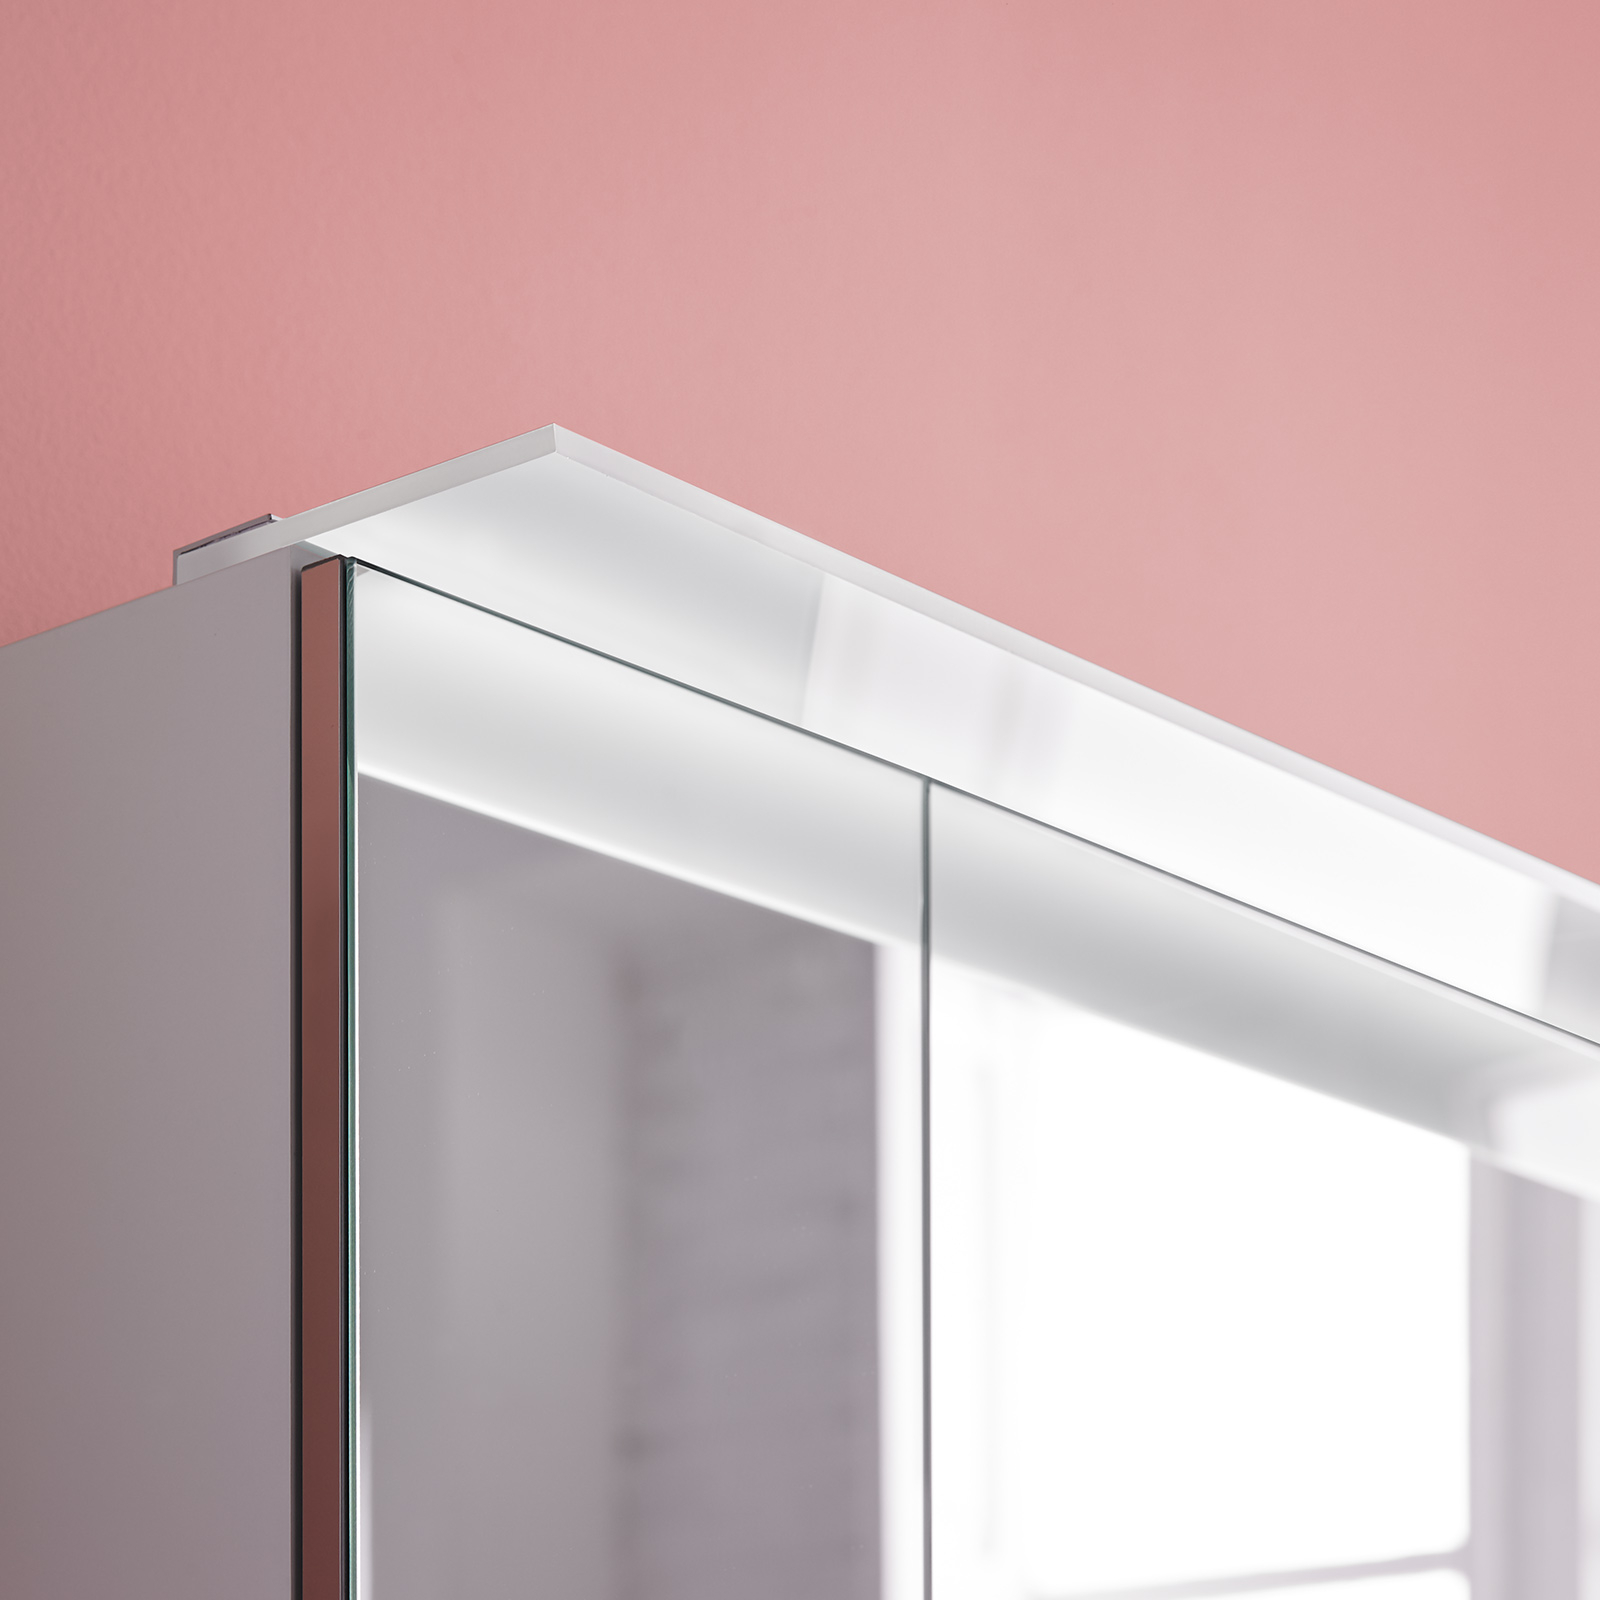 LED-möbelpåbyggnadslampa Adele, bredd 100 cm